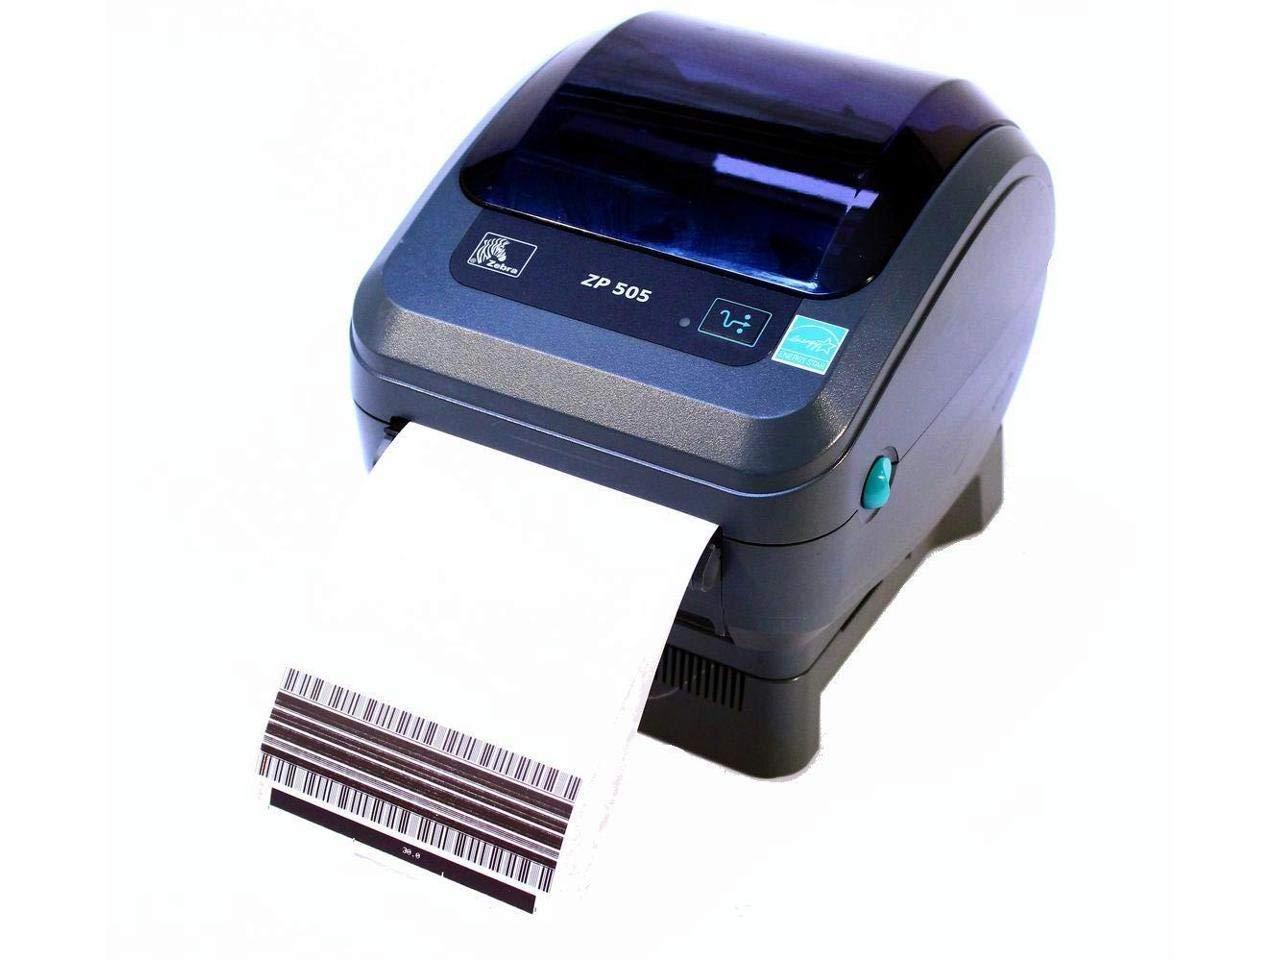 Zebra ZP505 Pro Network Thermal Printer (Ethernet Version)